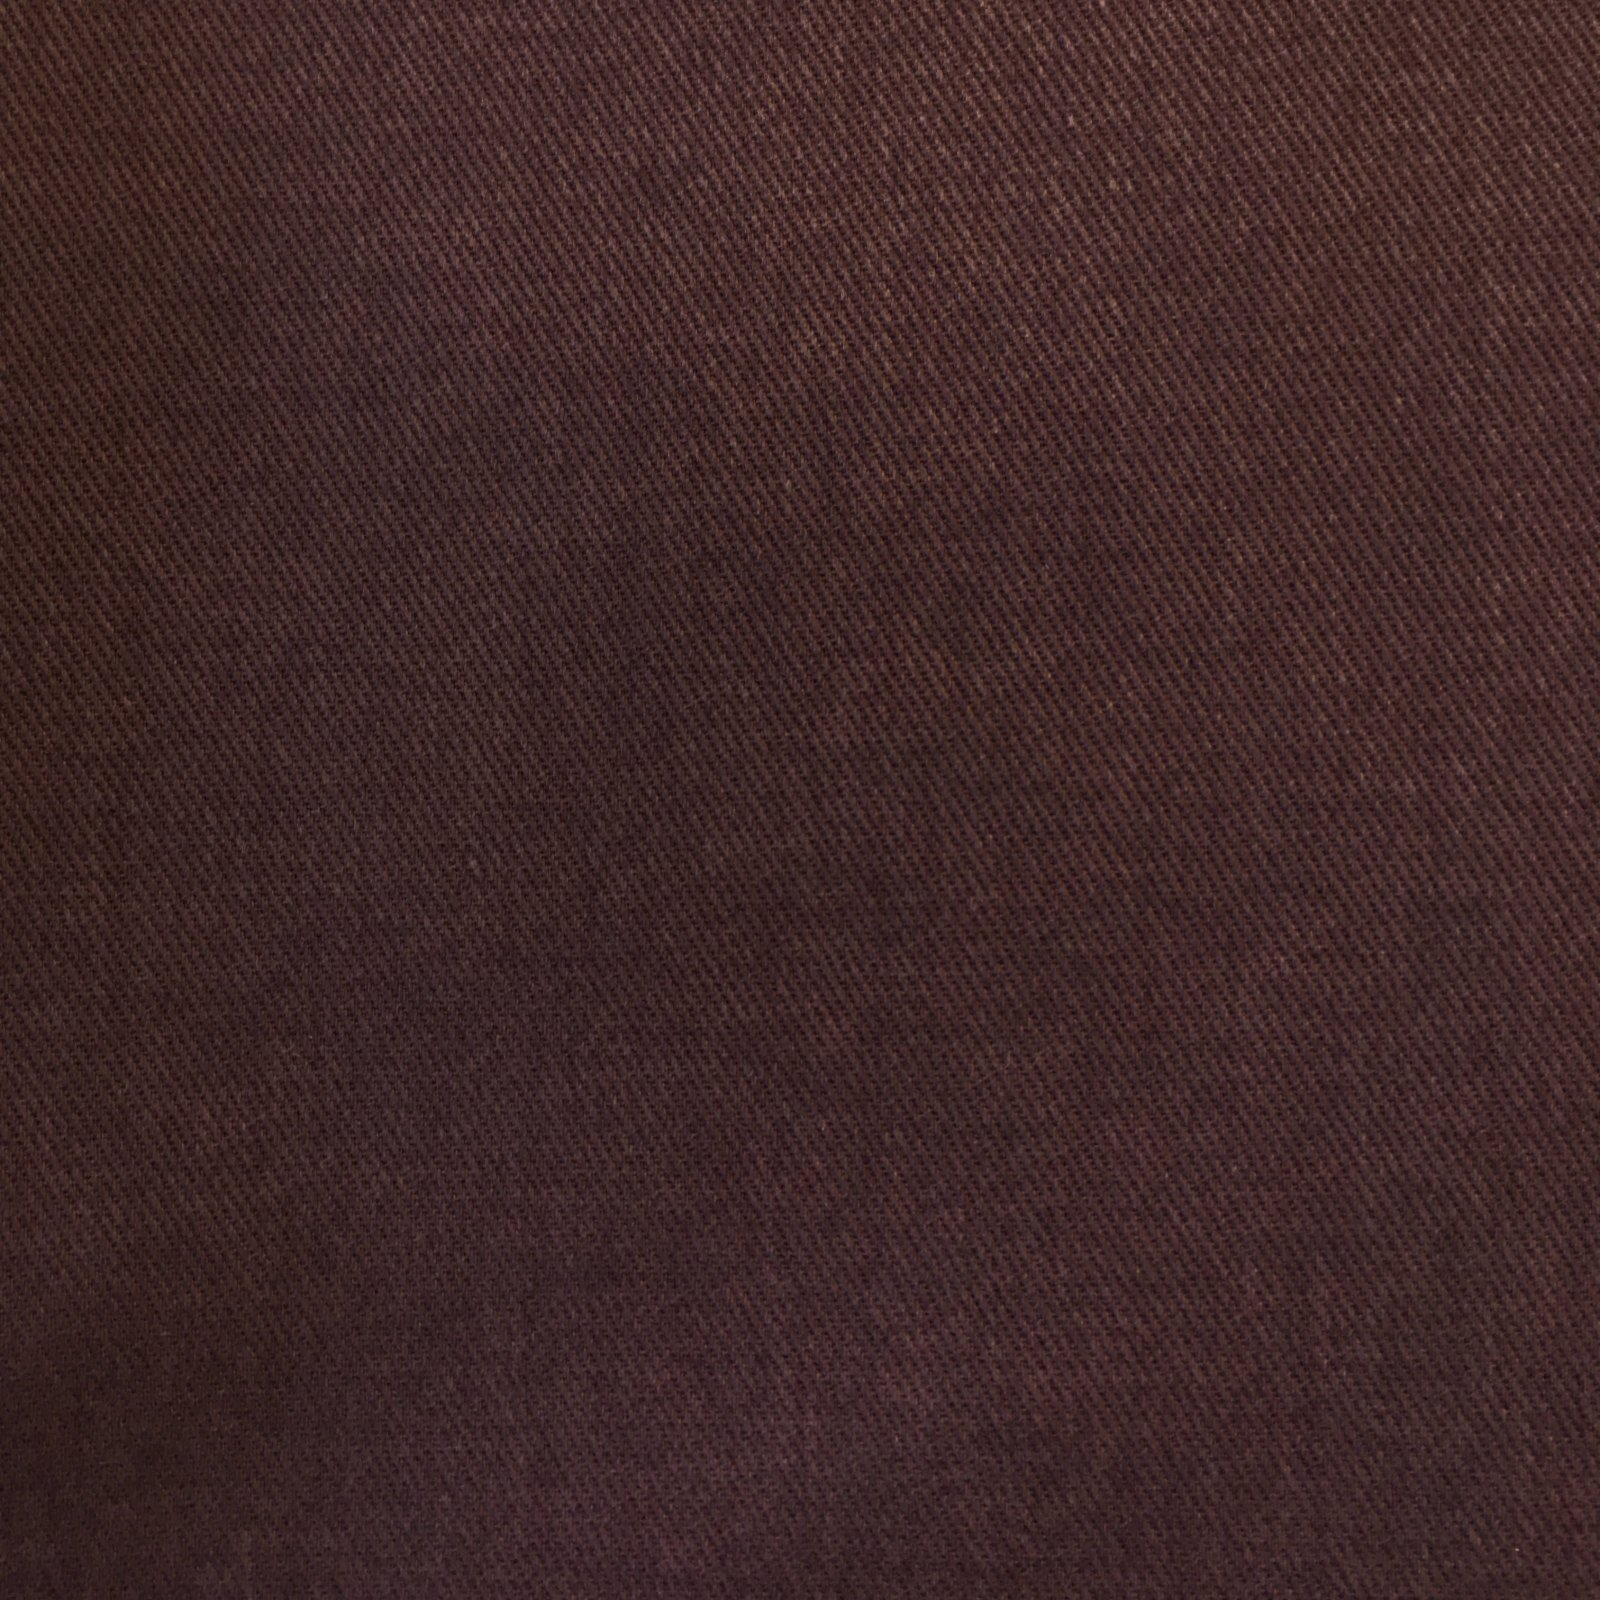 Japanese Printed Cotton Twill - Plum